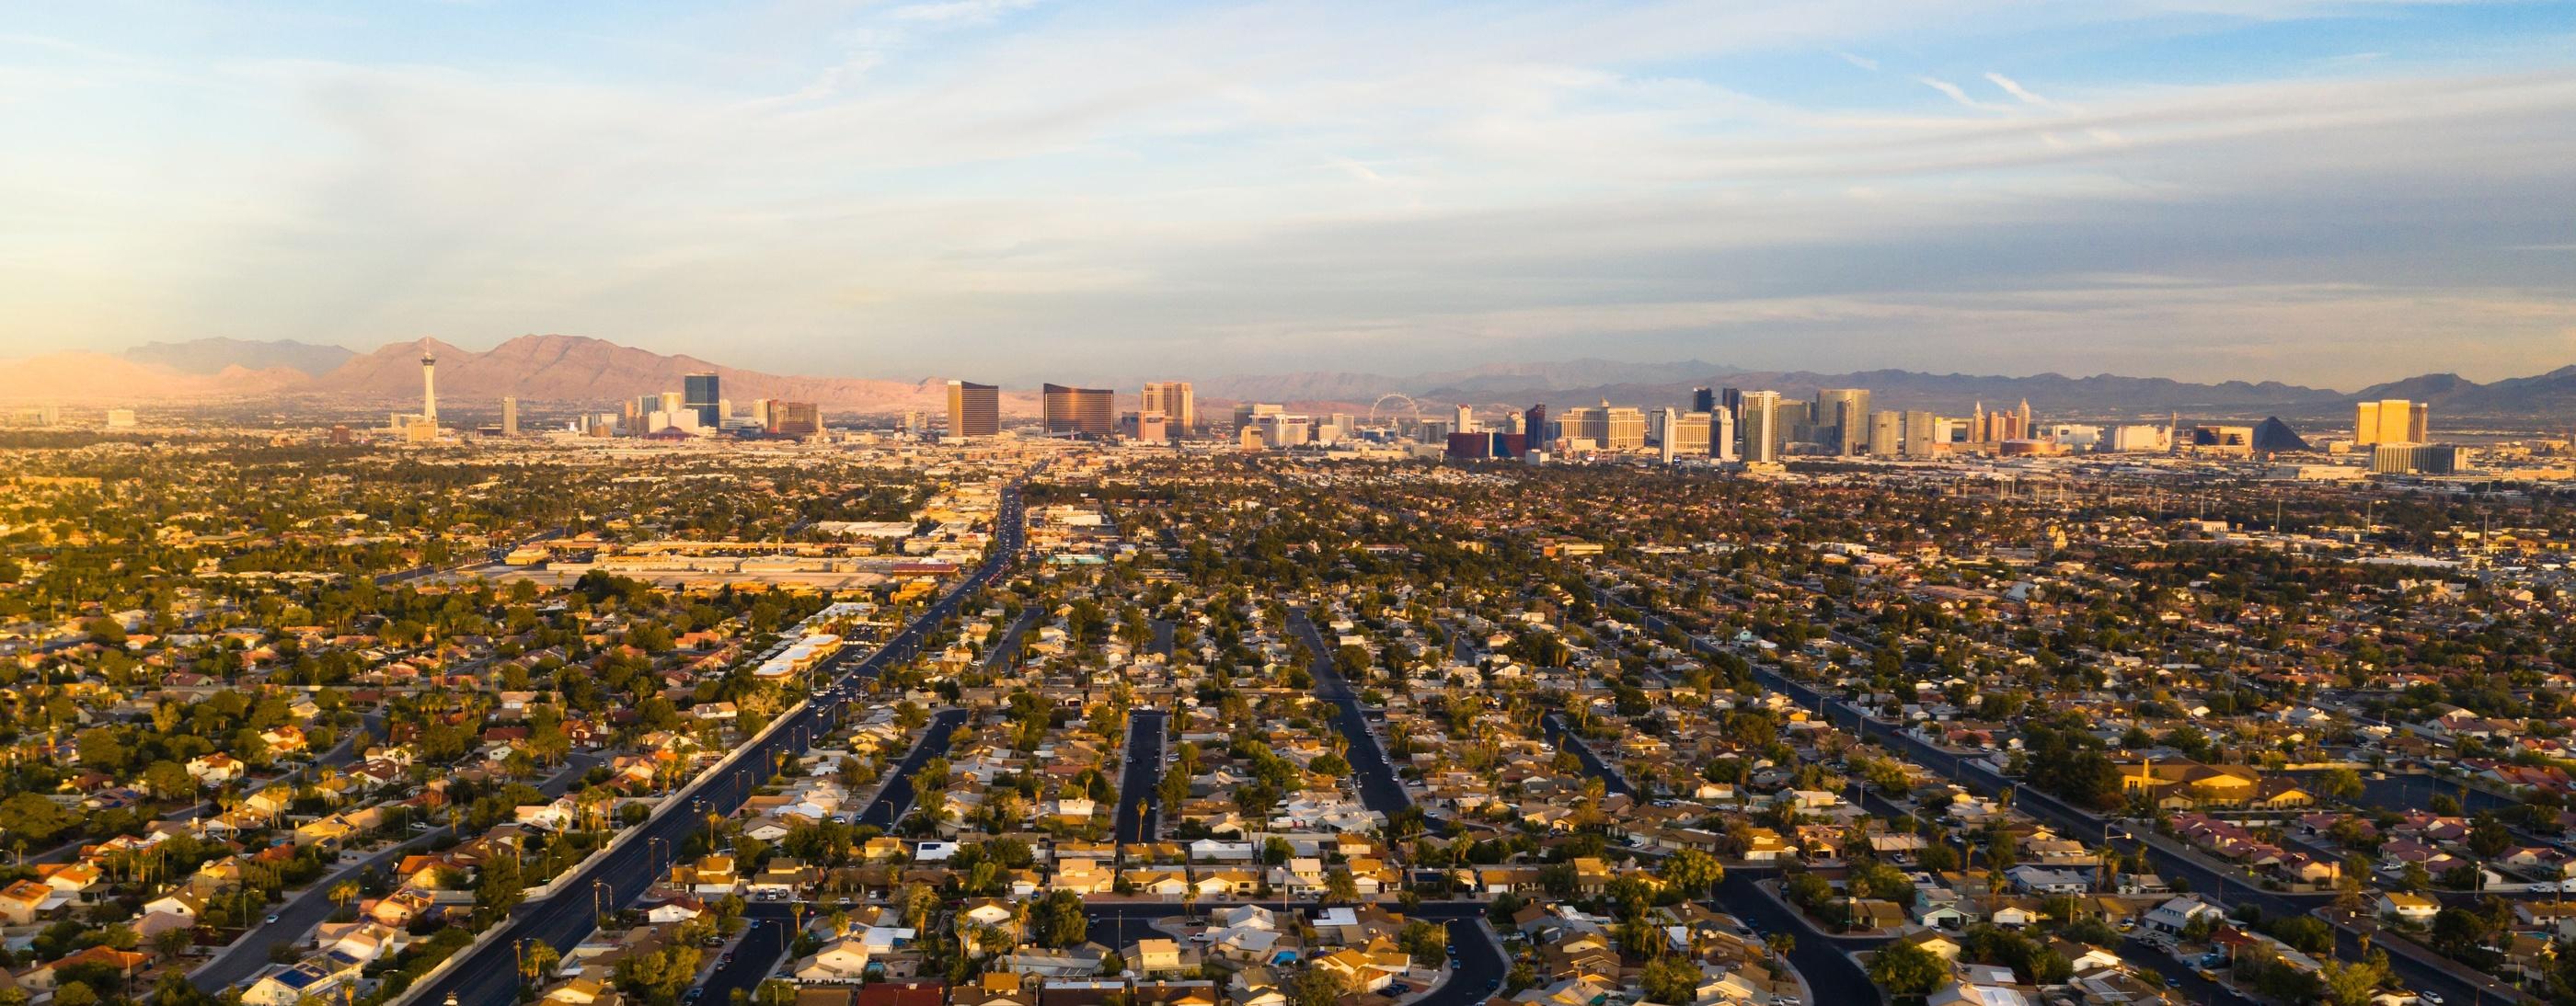 Las Vegas cover image